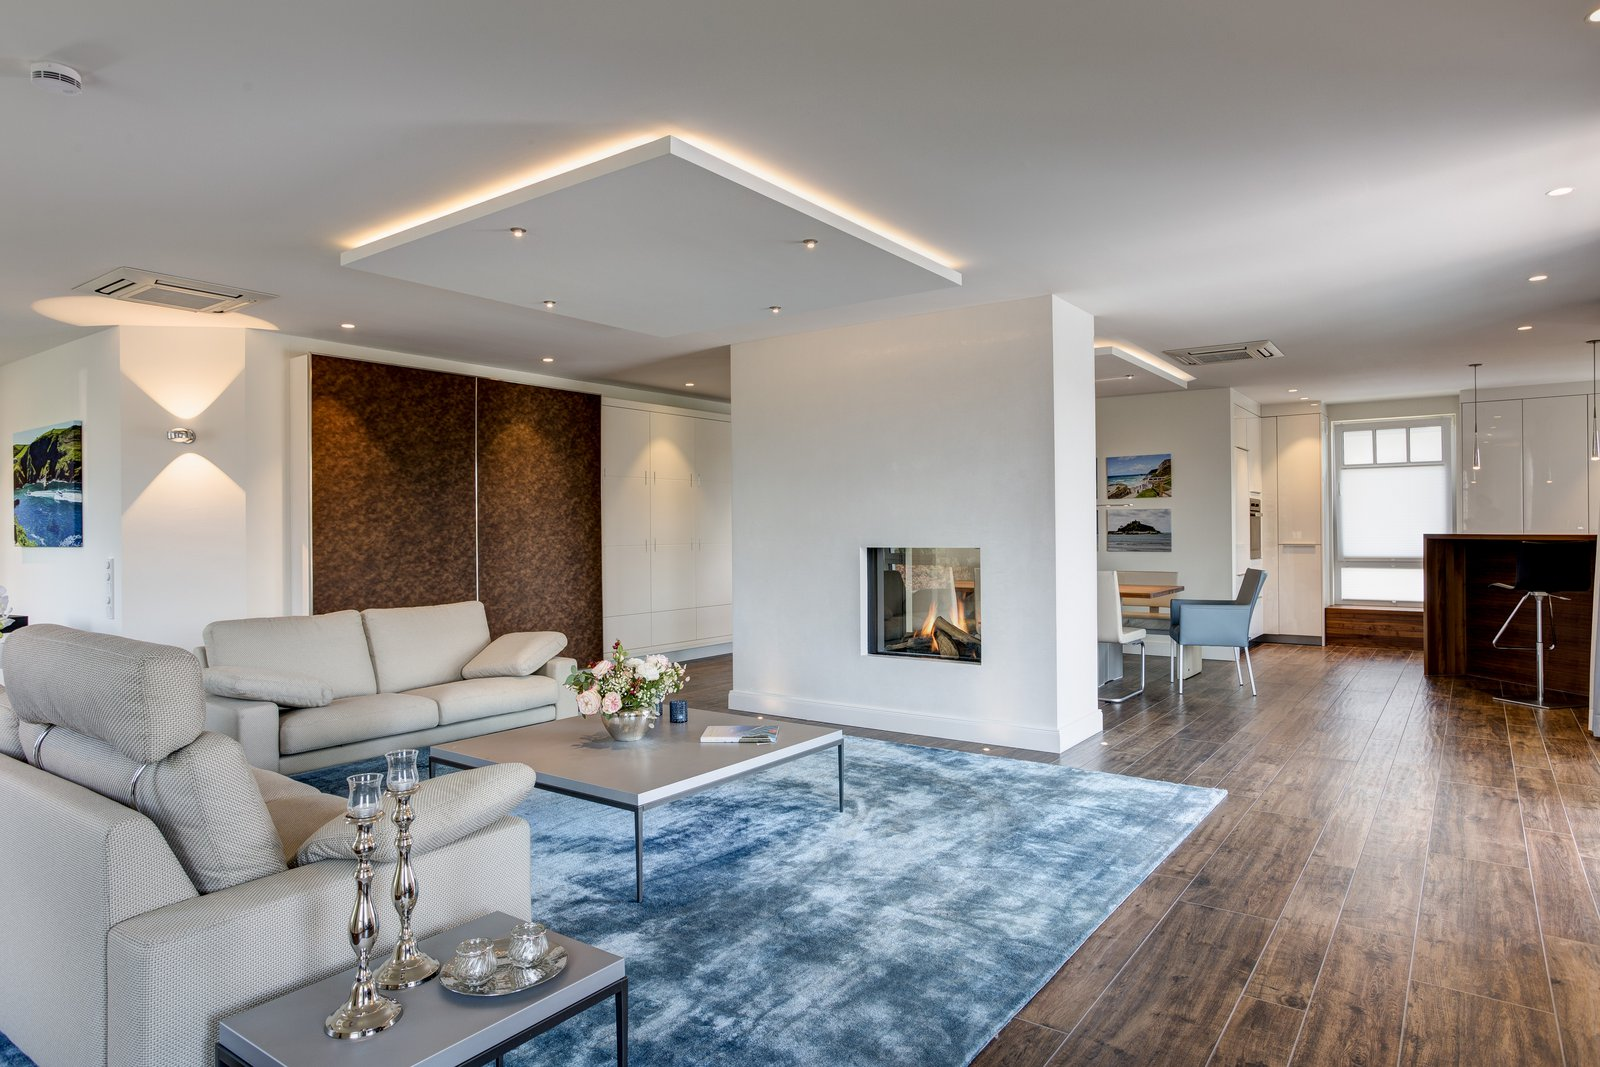 seniorengerechtes raumkonzept f r penthouse neubau embert innenarchitektur. Black Bedroom Furniture Sets. Home Design Ideas